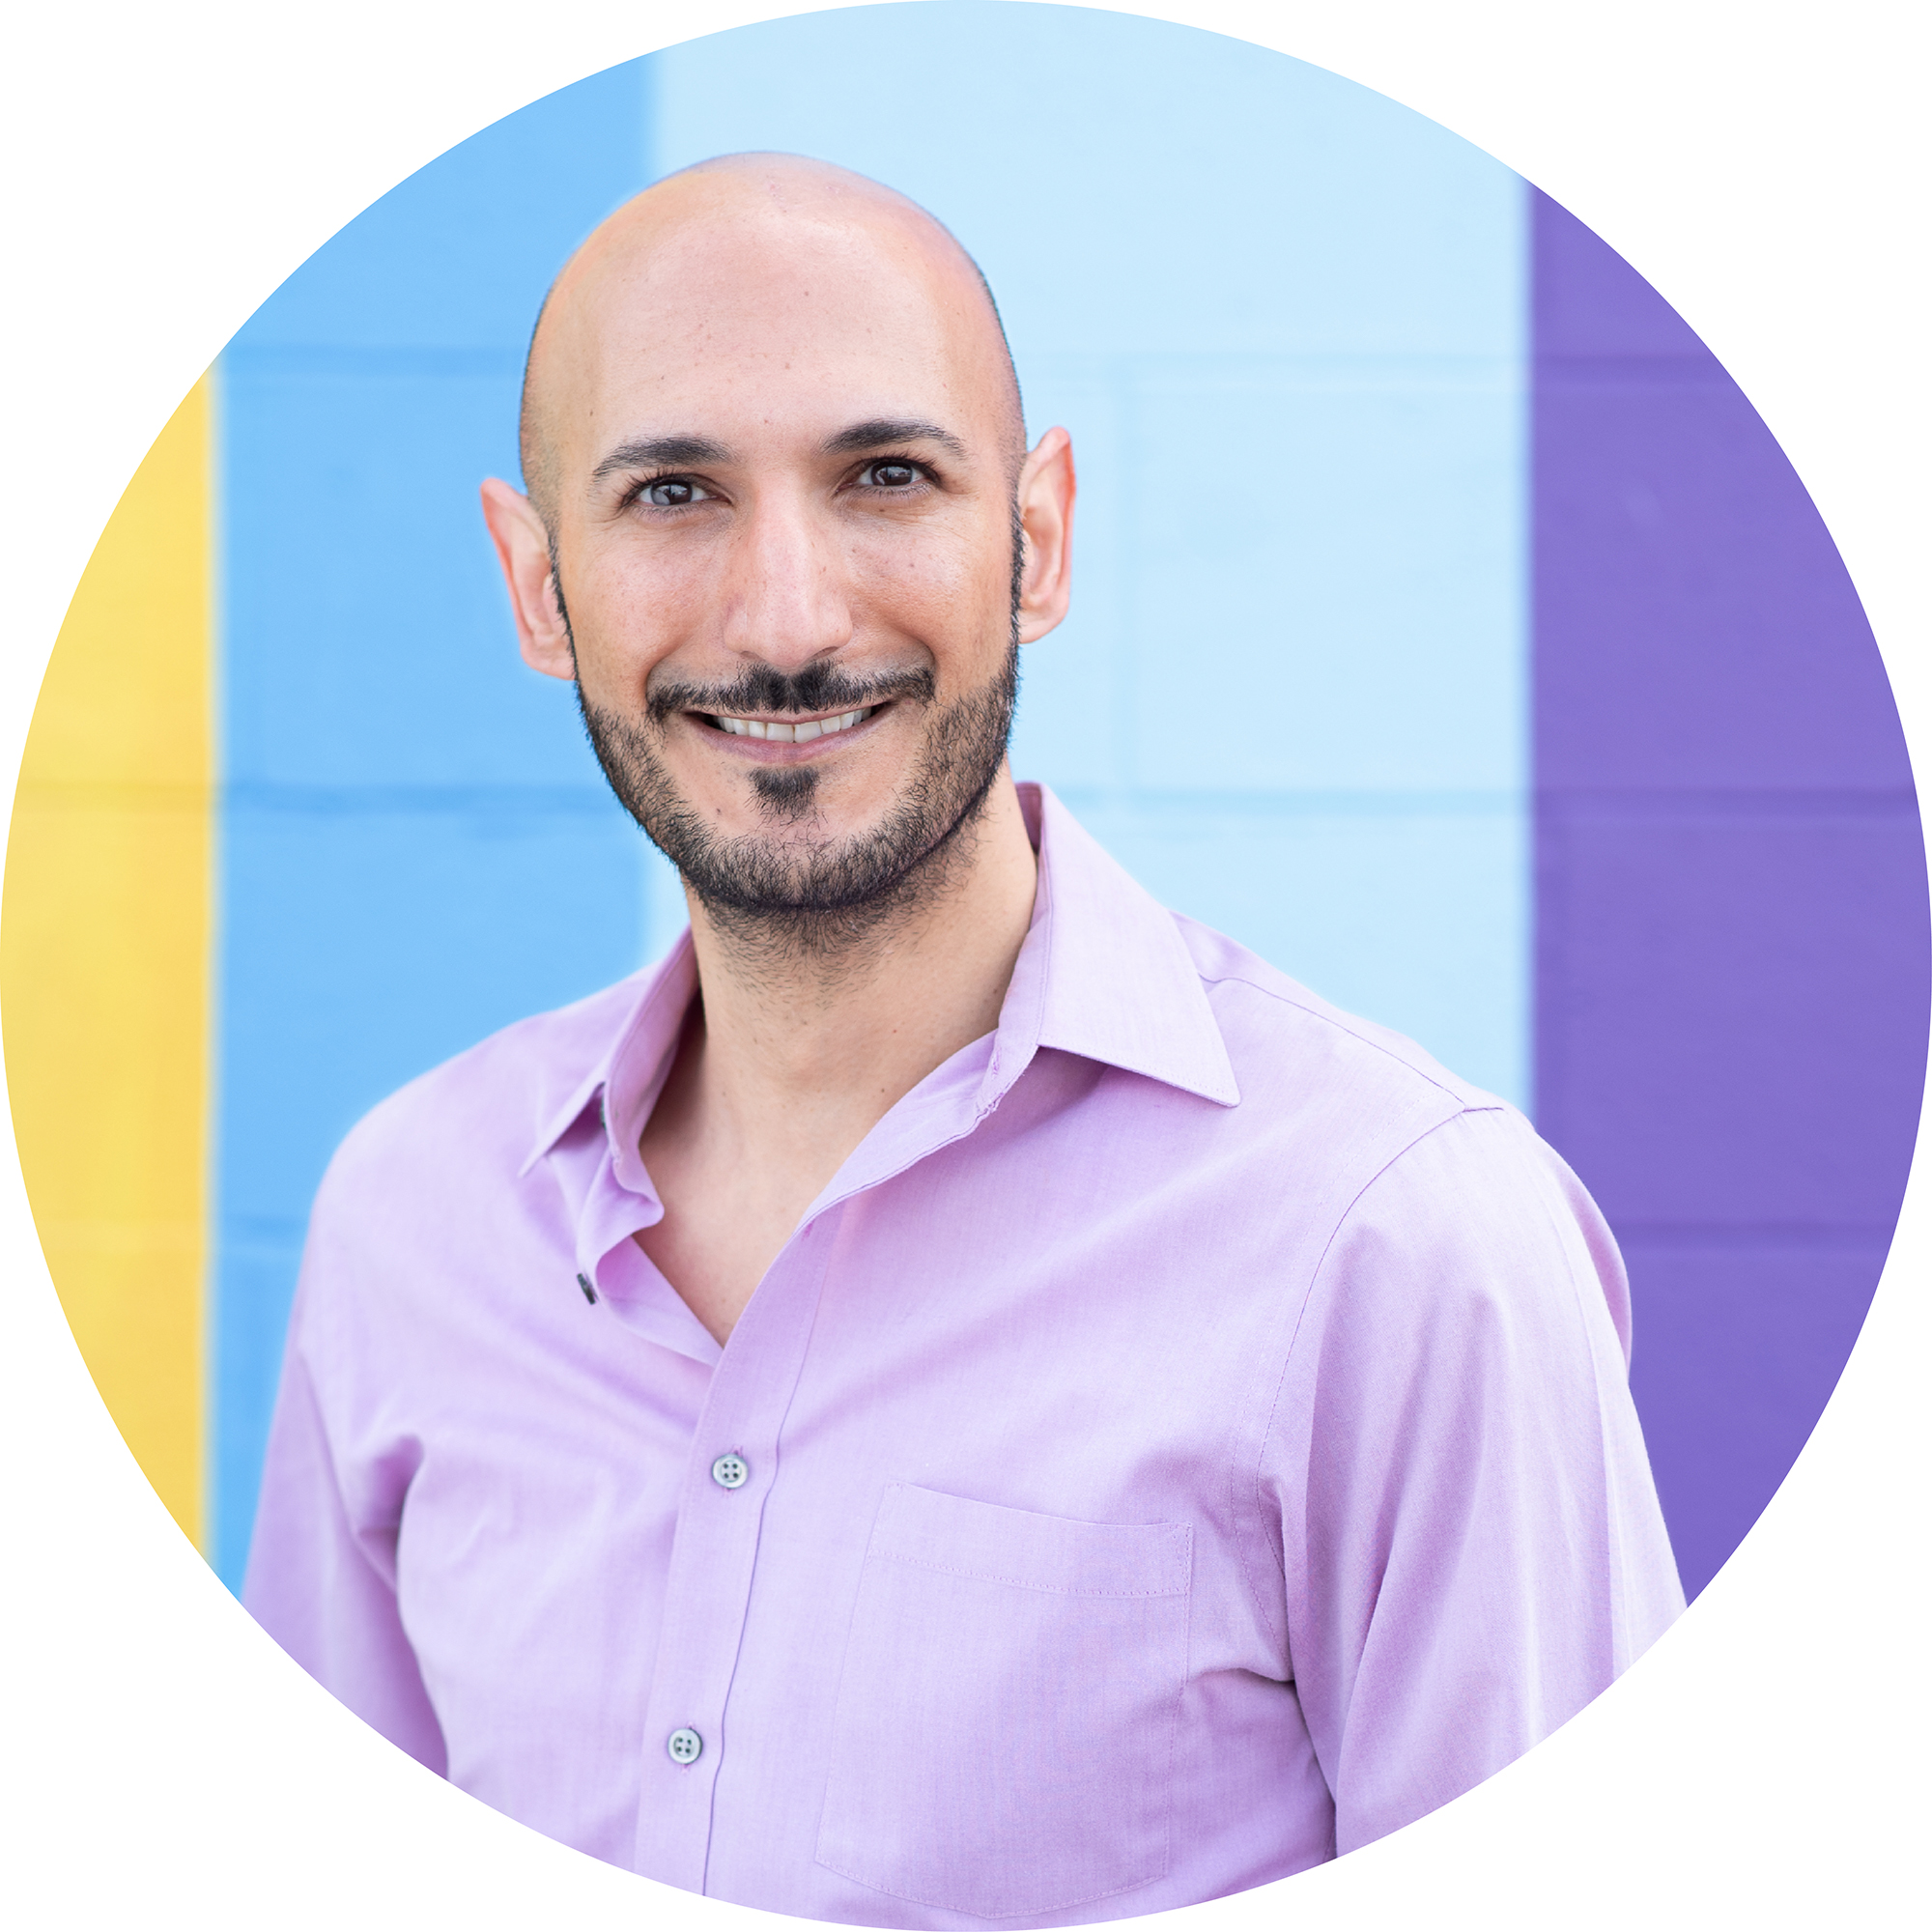 Dr. Lior Ben Avraham